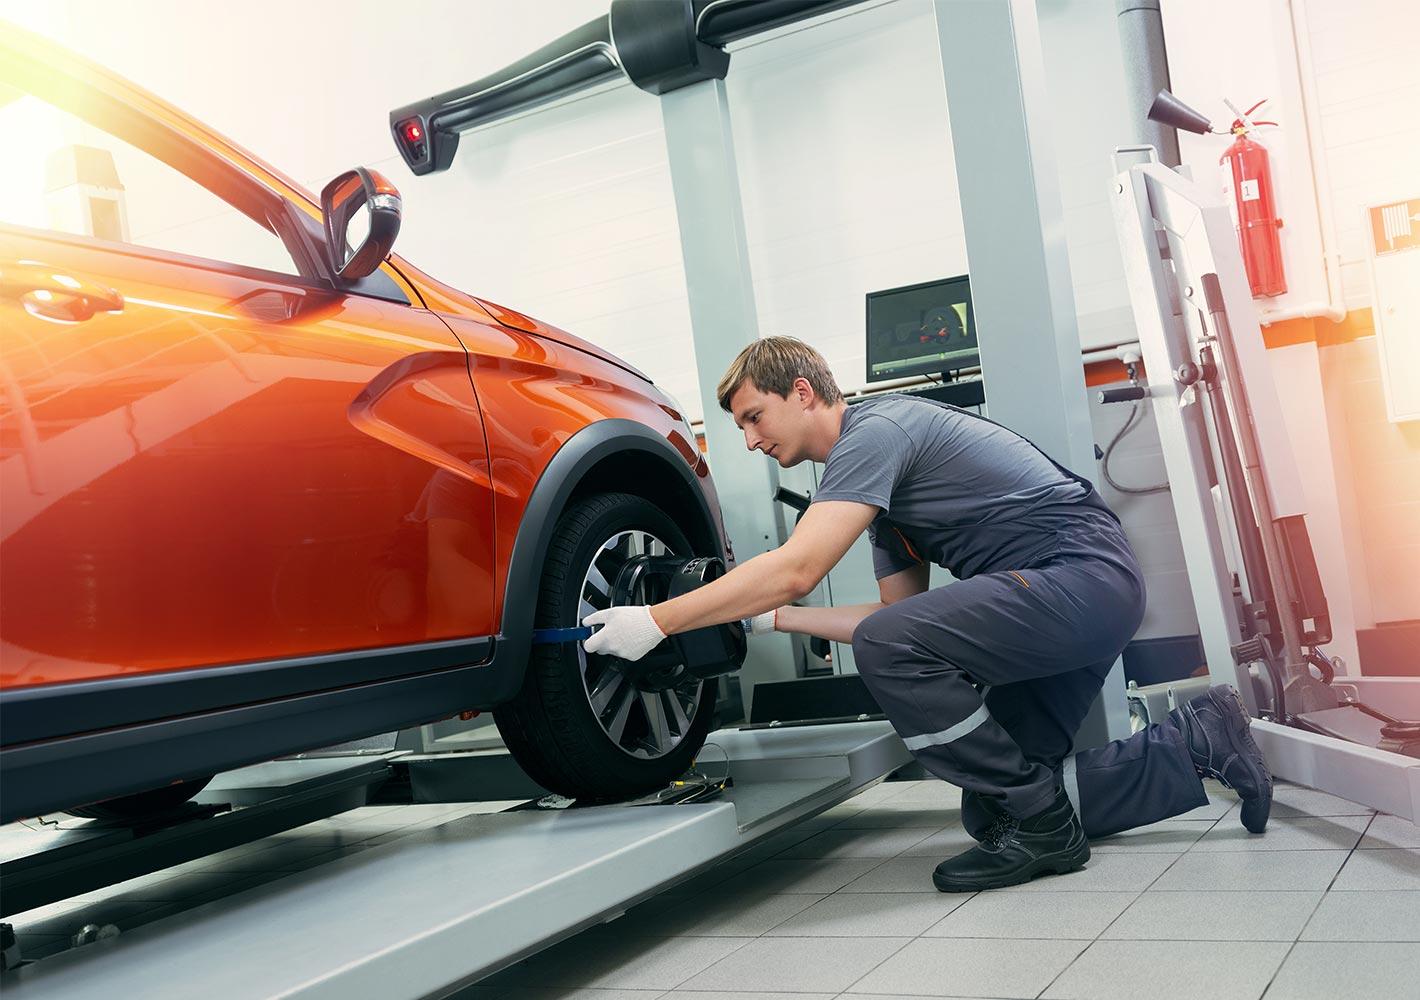 Регулировка углов установки колес